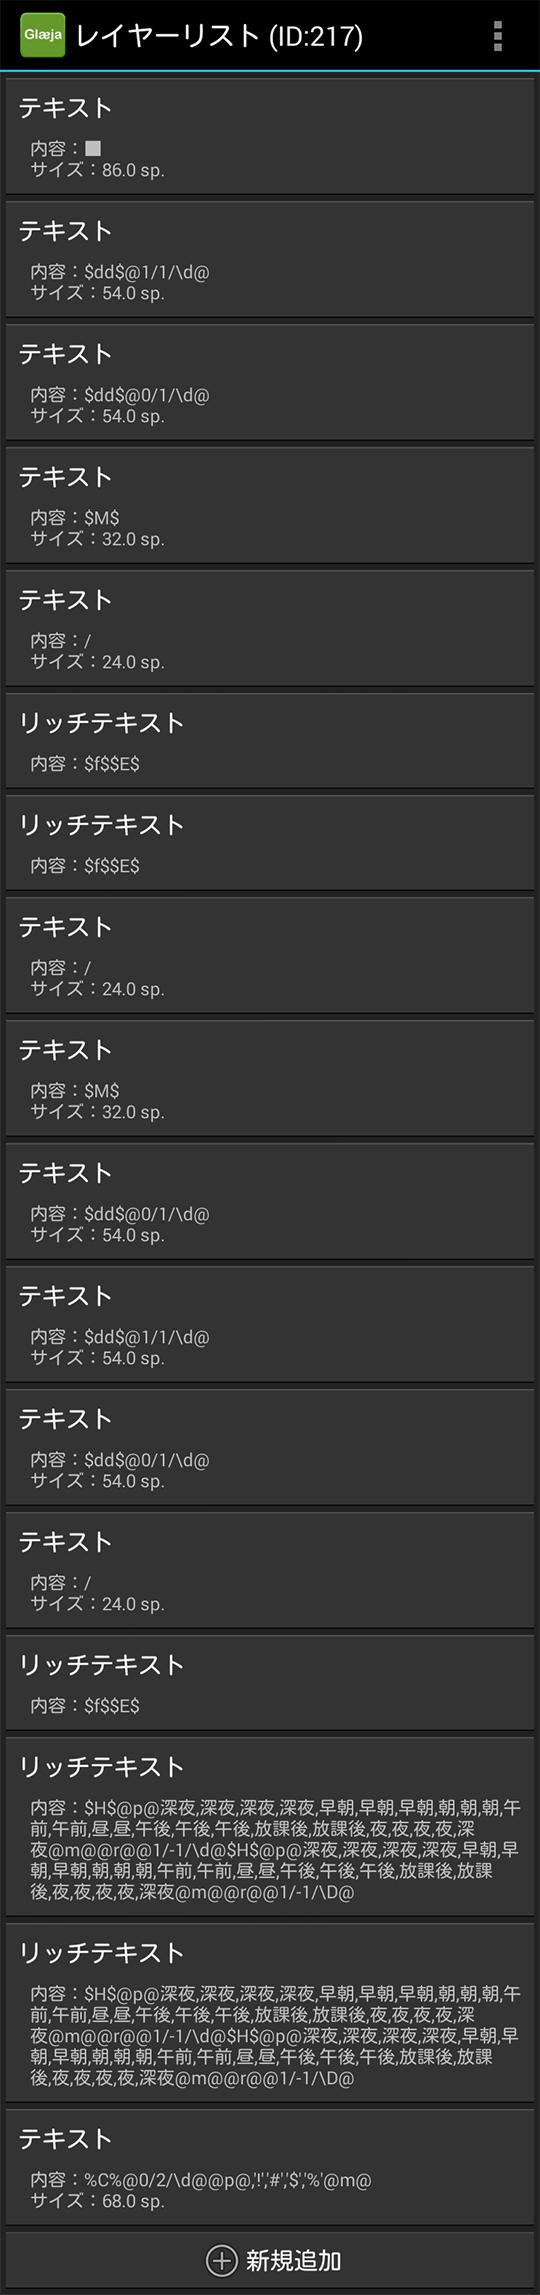 20151108-p5-4